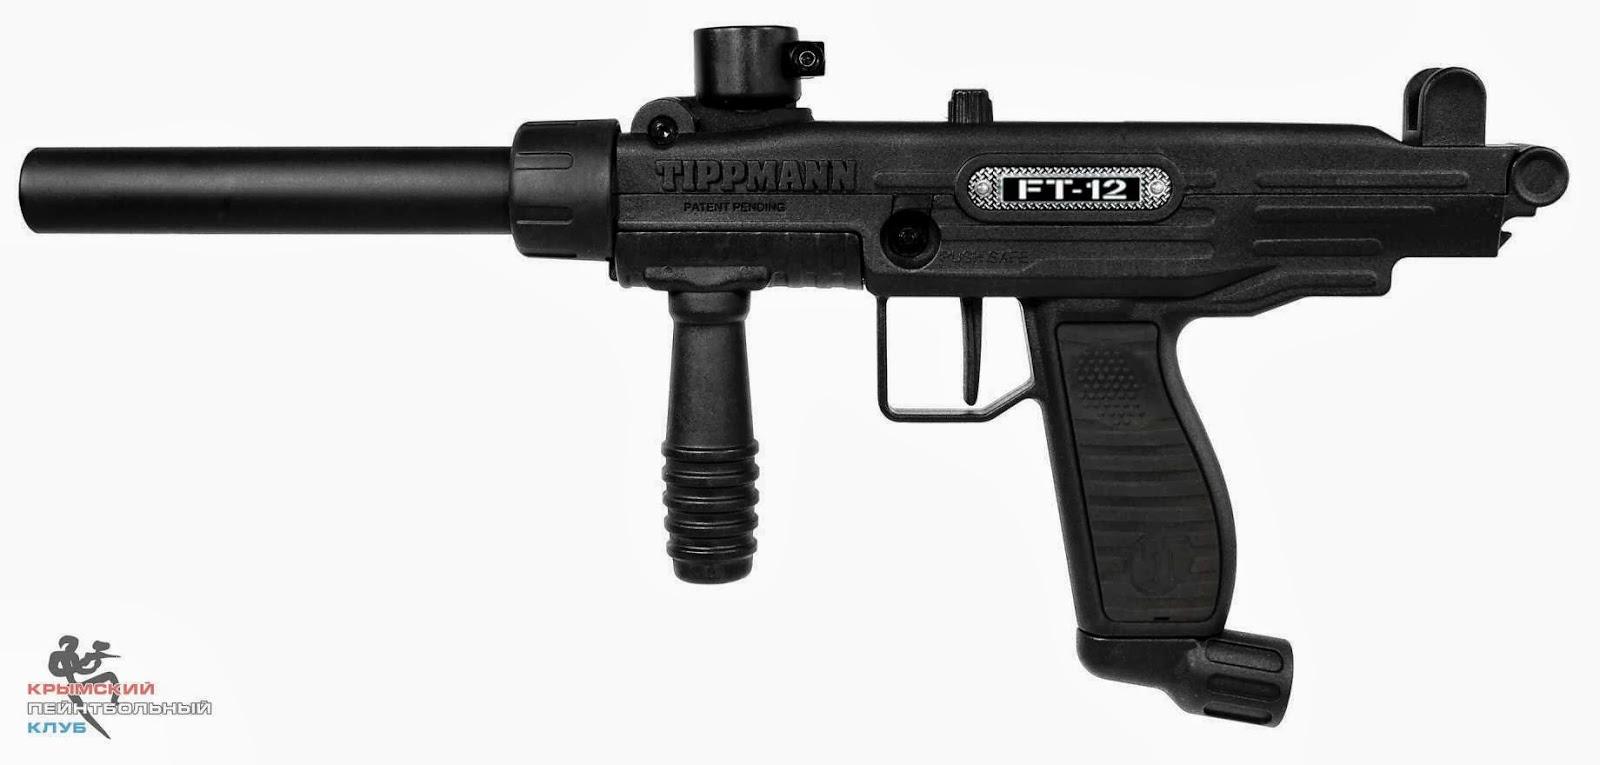 Пейнтбольный маркер Tippmann FT-12.